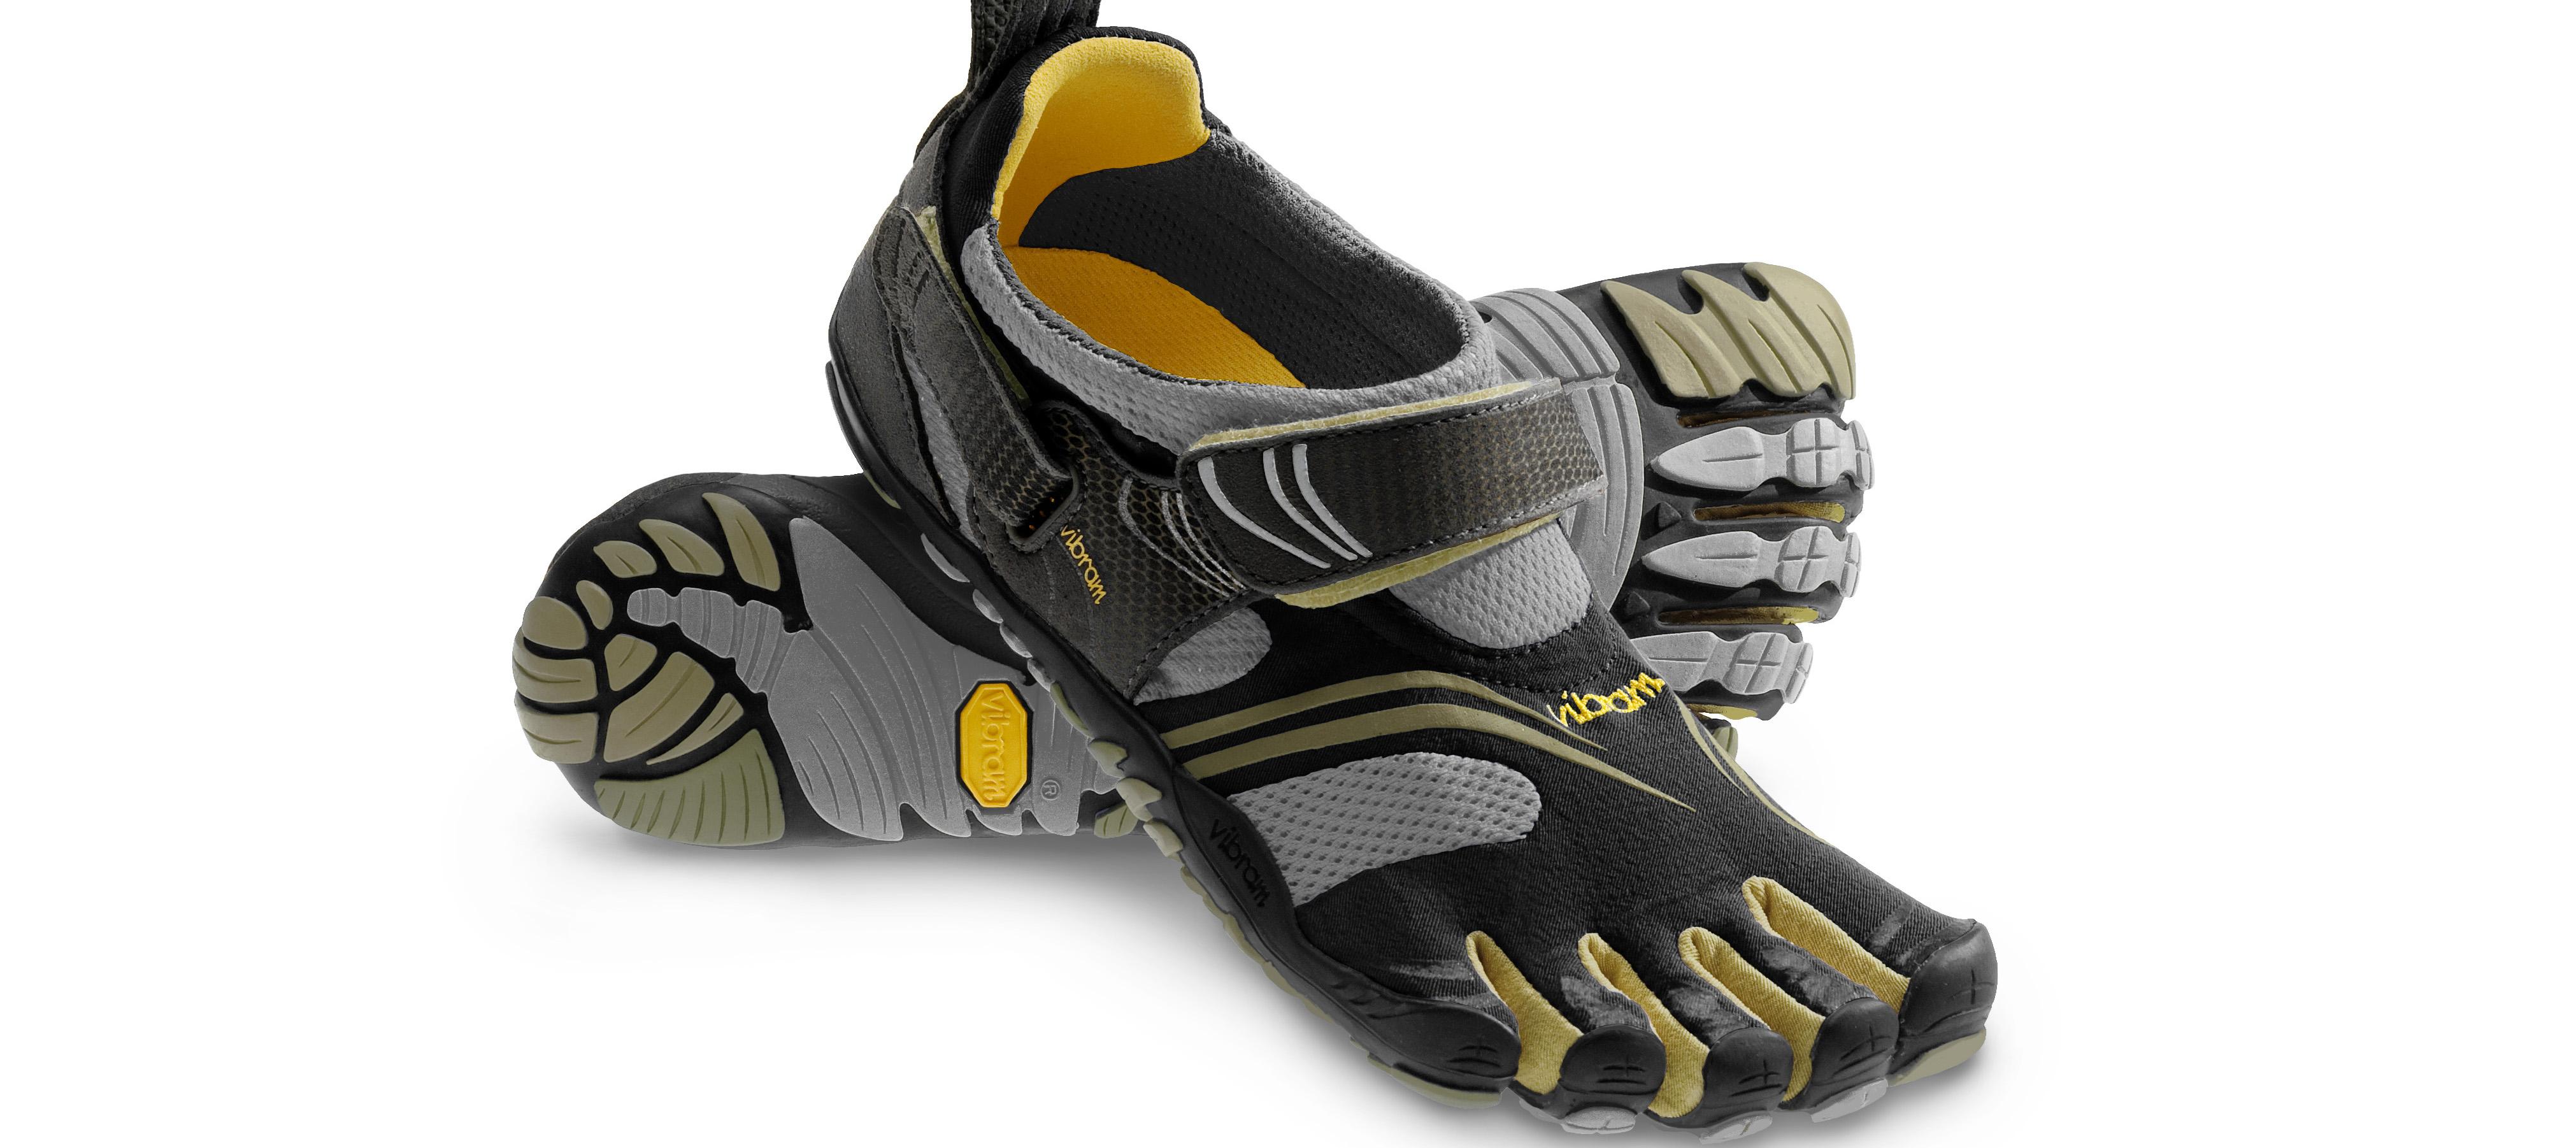 Komodo-Sport-W3681-hero-black-gold-grey-barefoot-minimalist-natural-crossfit-running-shoes